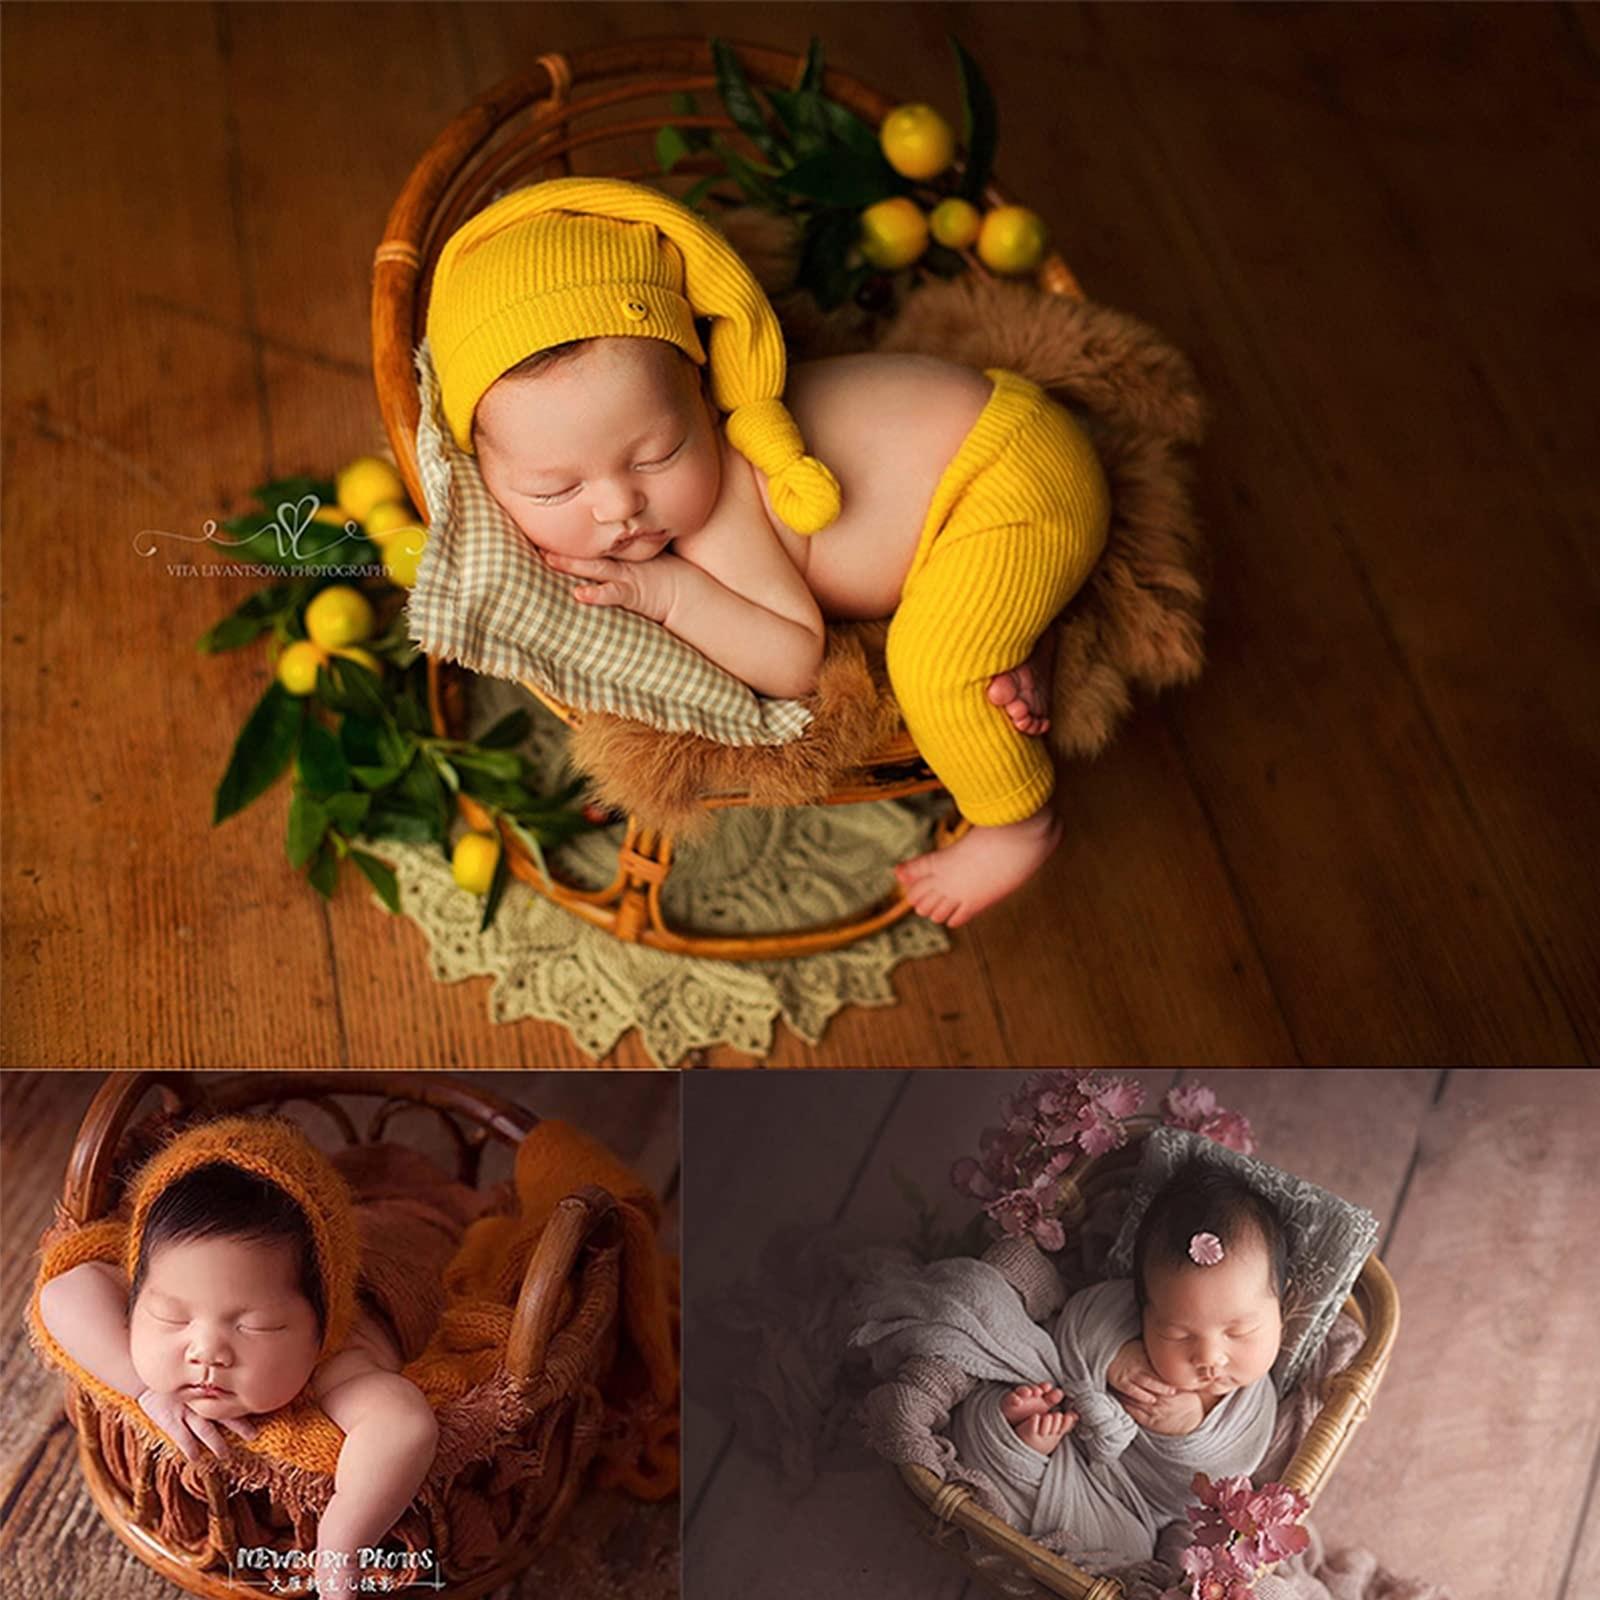 Newborn Photography Props Retro Handmade Rattan Chair Basket Cribs Newborn Photo Shoot Posing Props Photo Studio Accessories enlarge